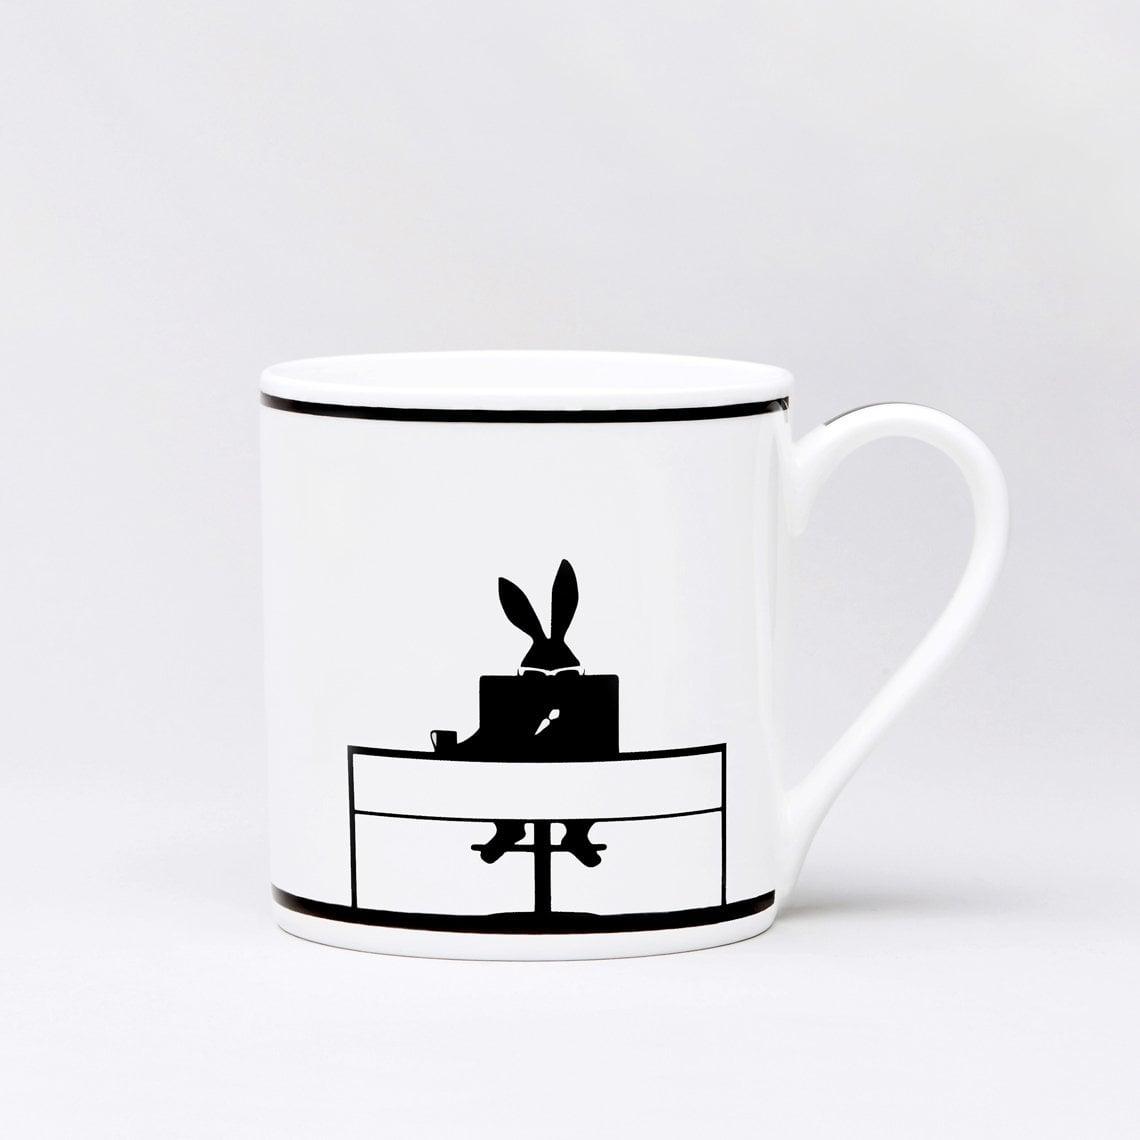 Working Rabbit Mug